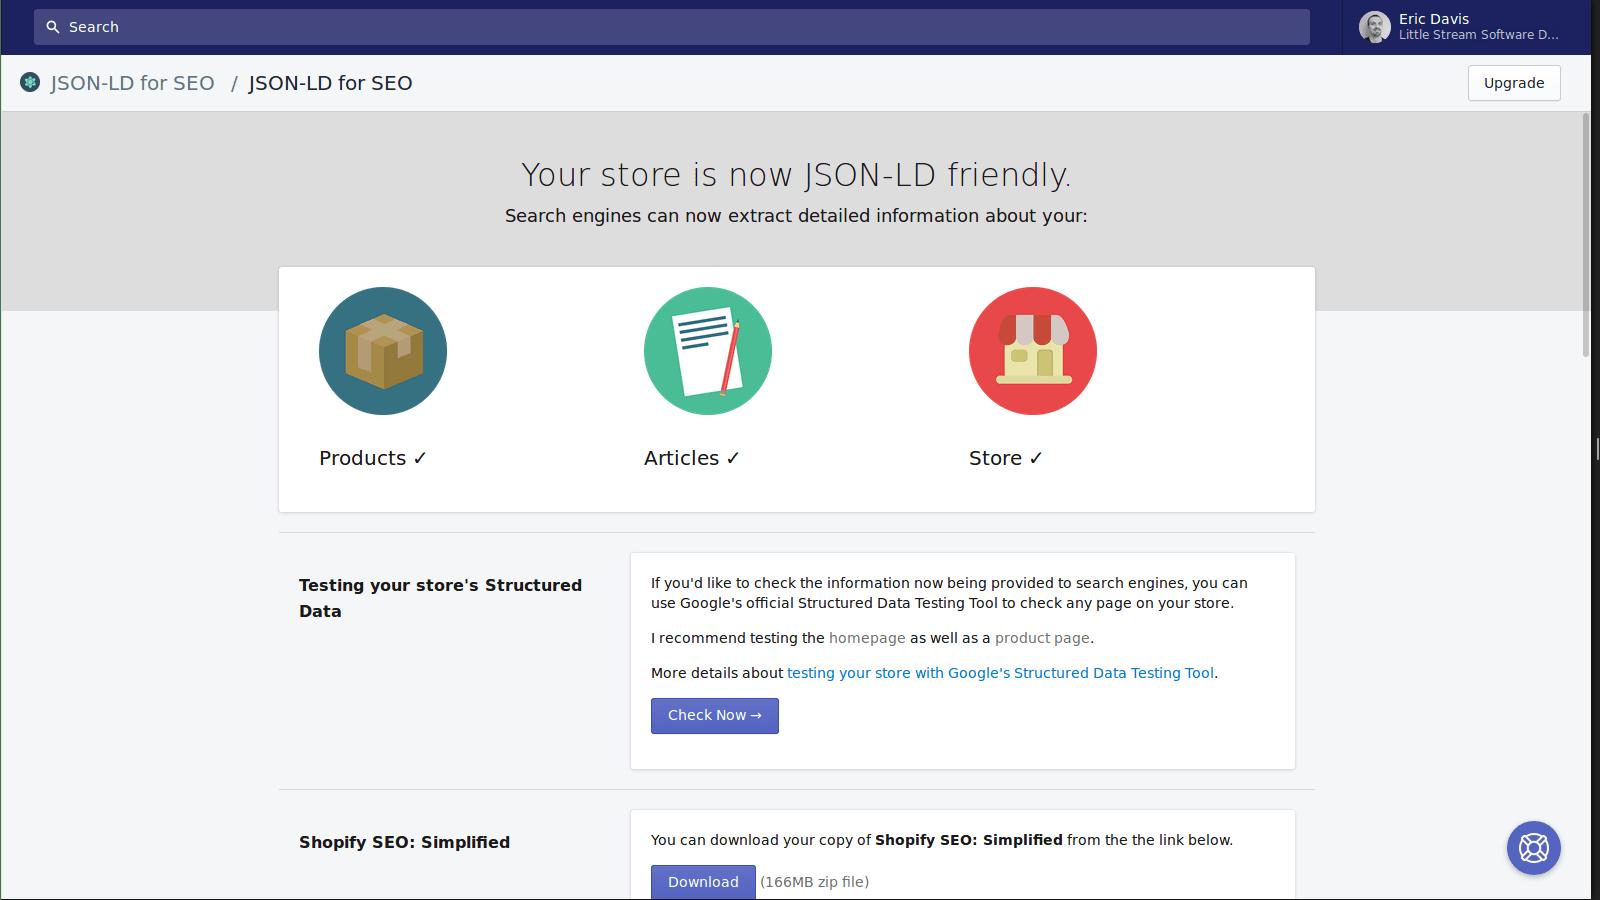 Screenshot of the JSON-LD for SEO dashboard